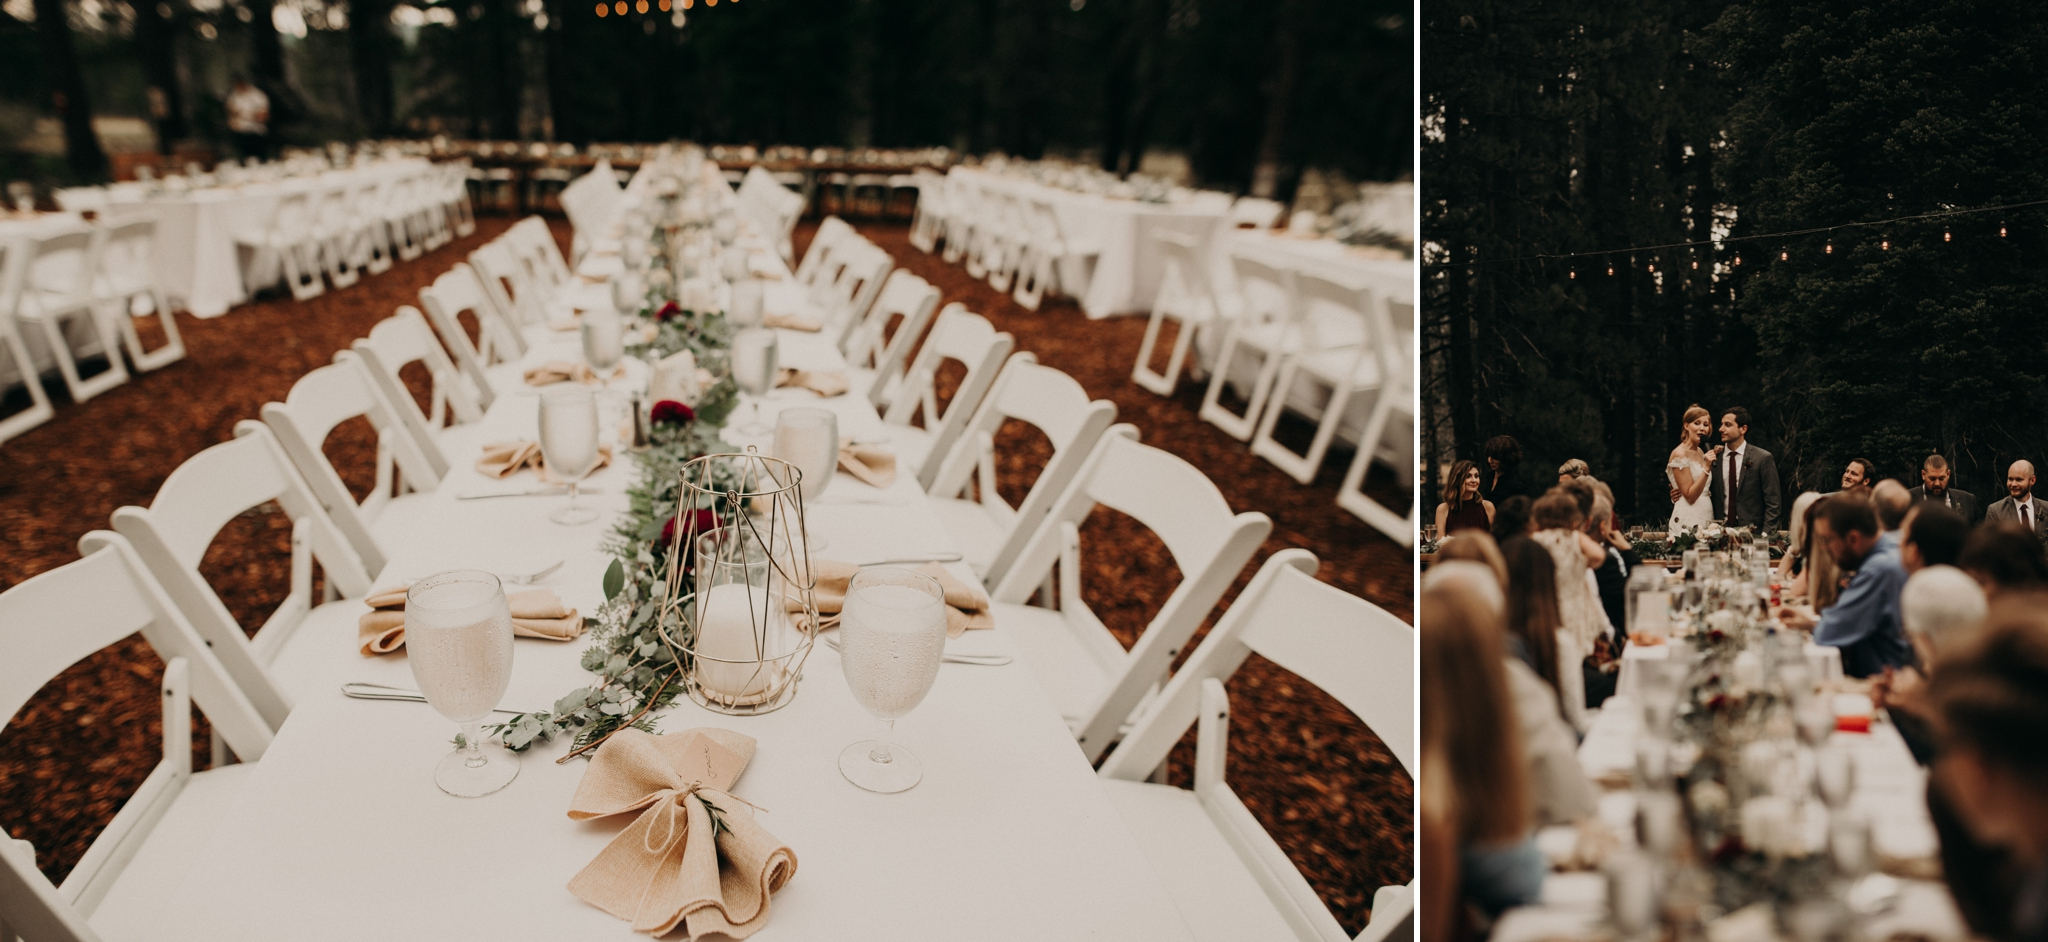 tahoe-wedding-photographer20.jpg